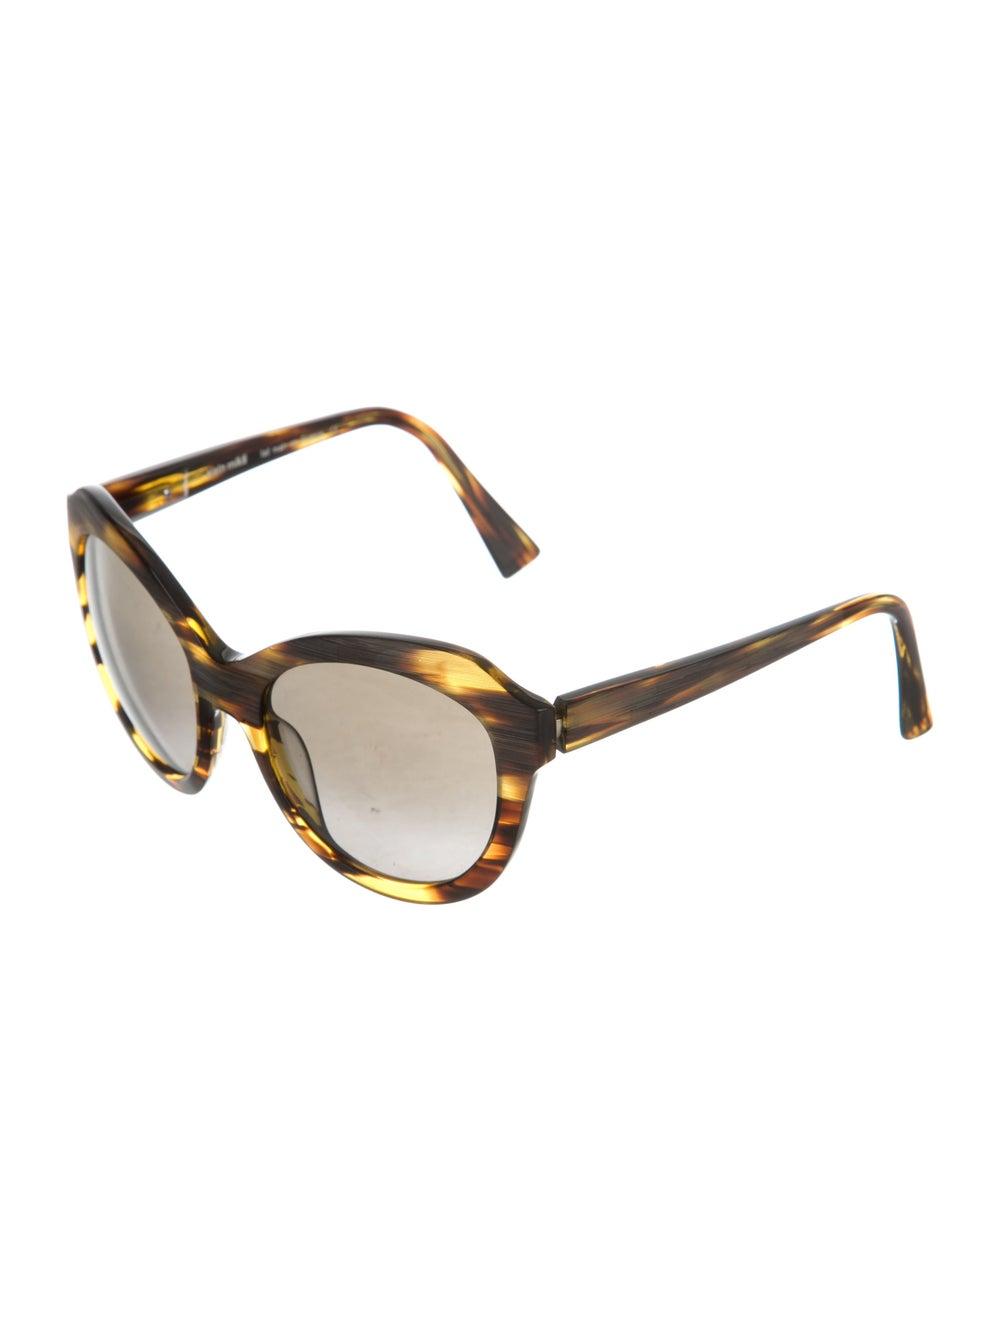 Alain Mikli Tortoiseshell Oversize Sunglasses - image 2